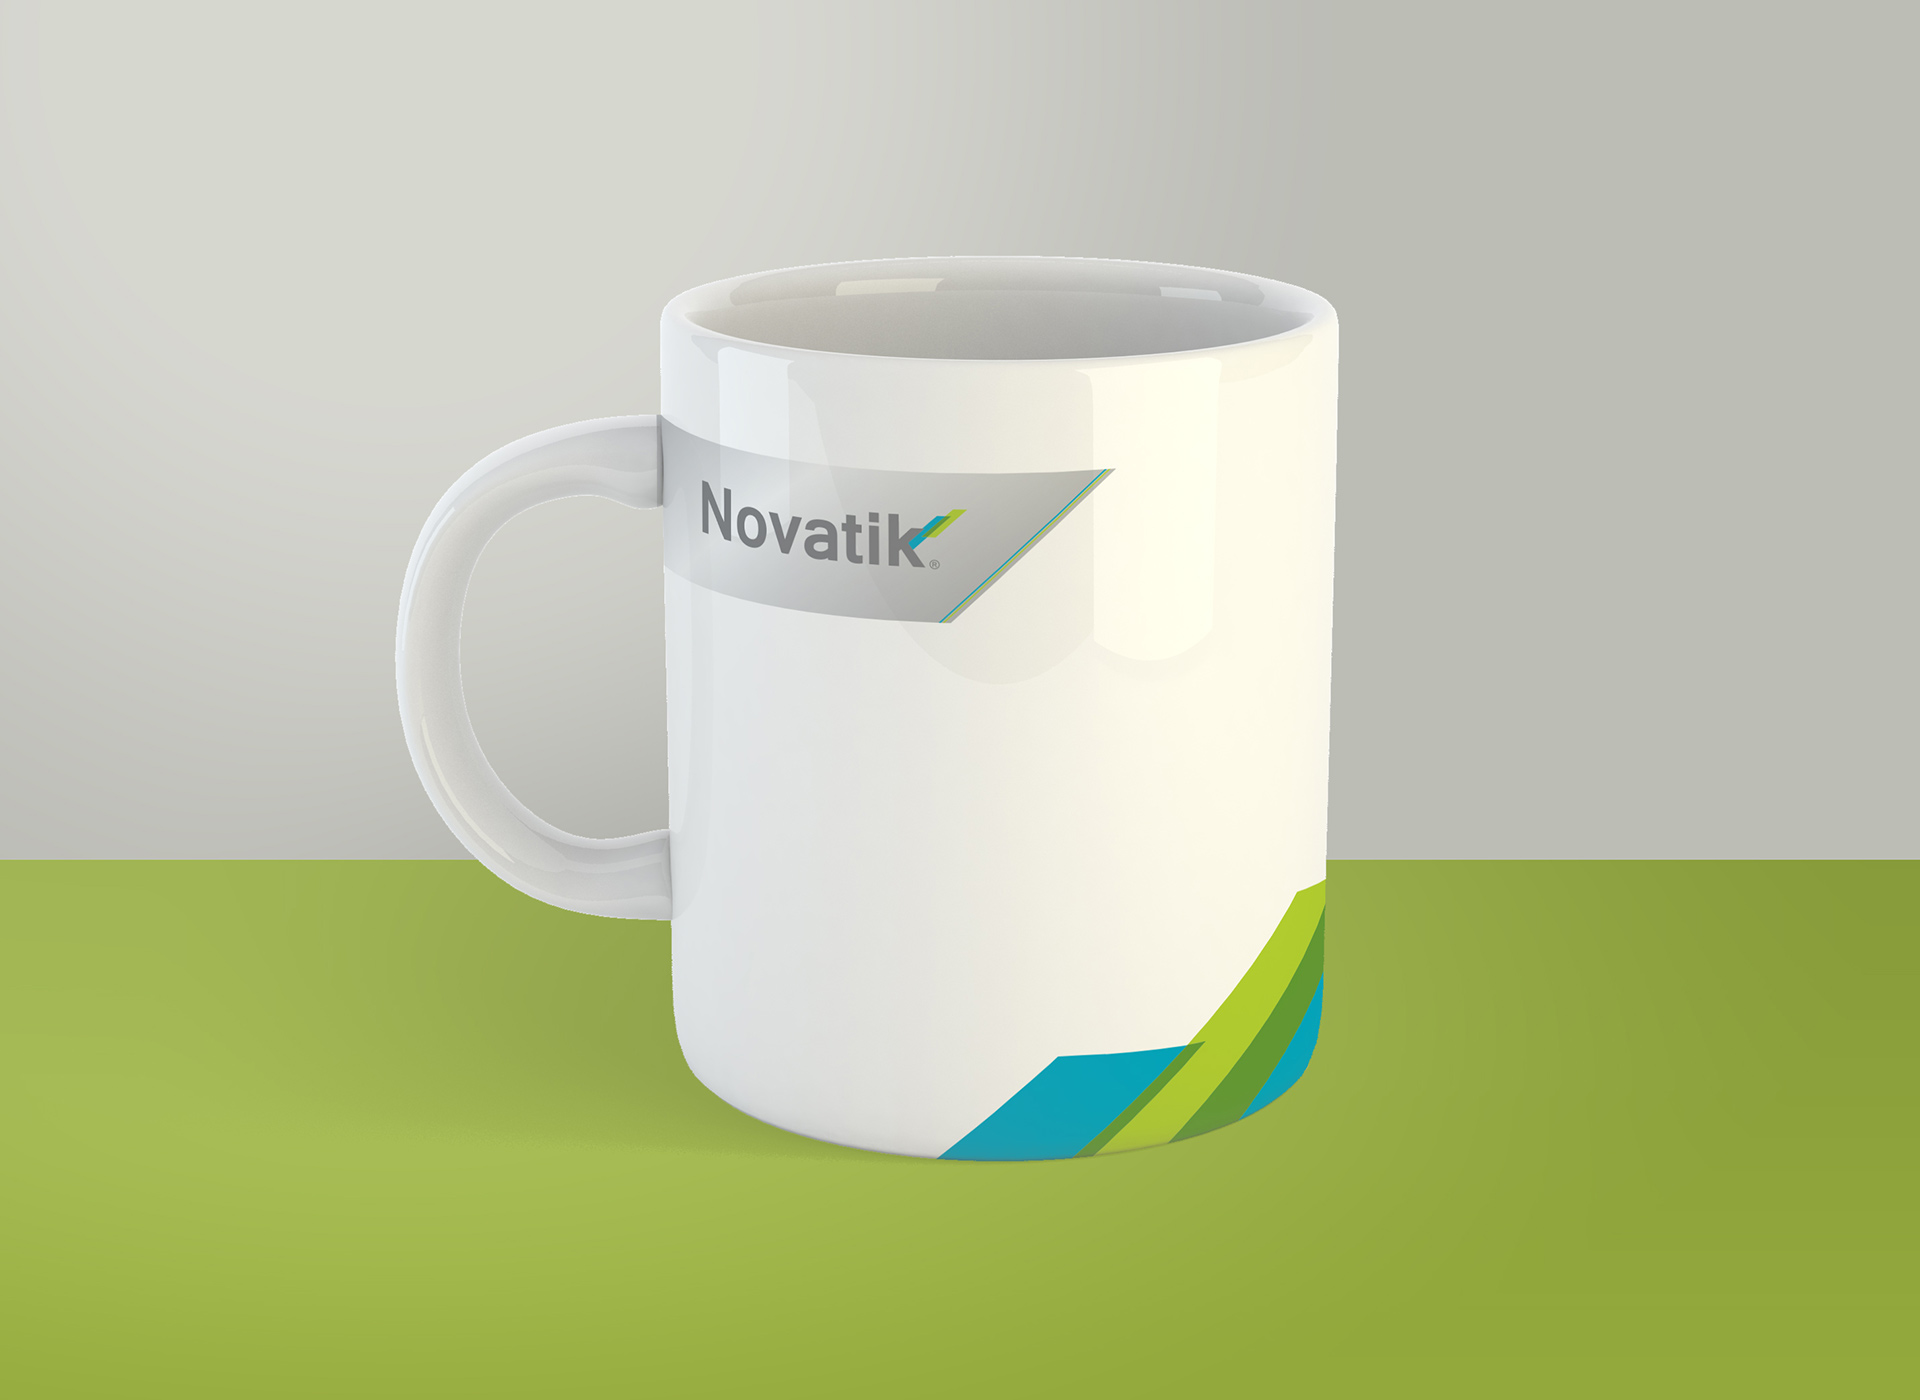 novatik portofoliu branding cup